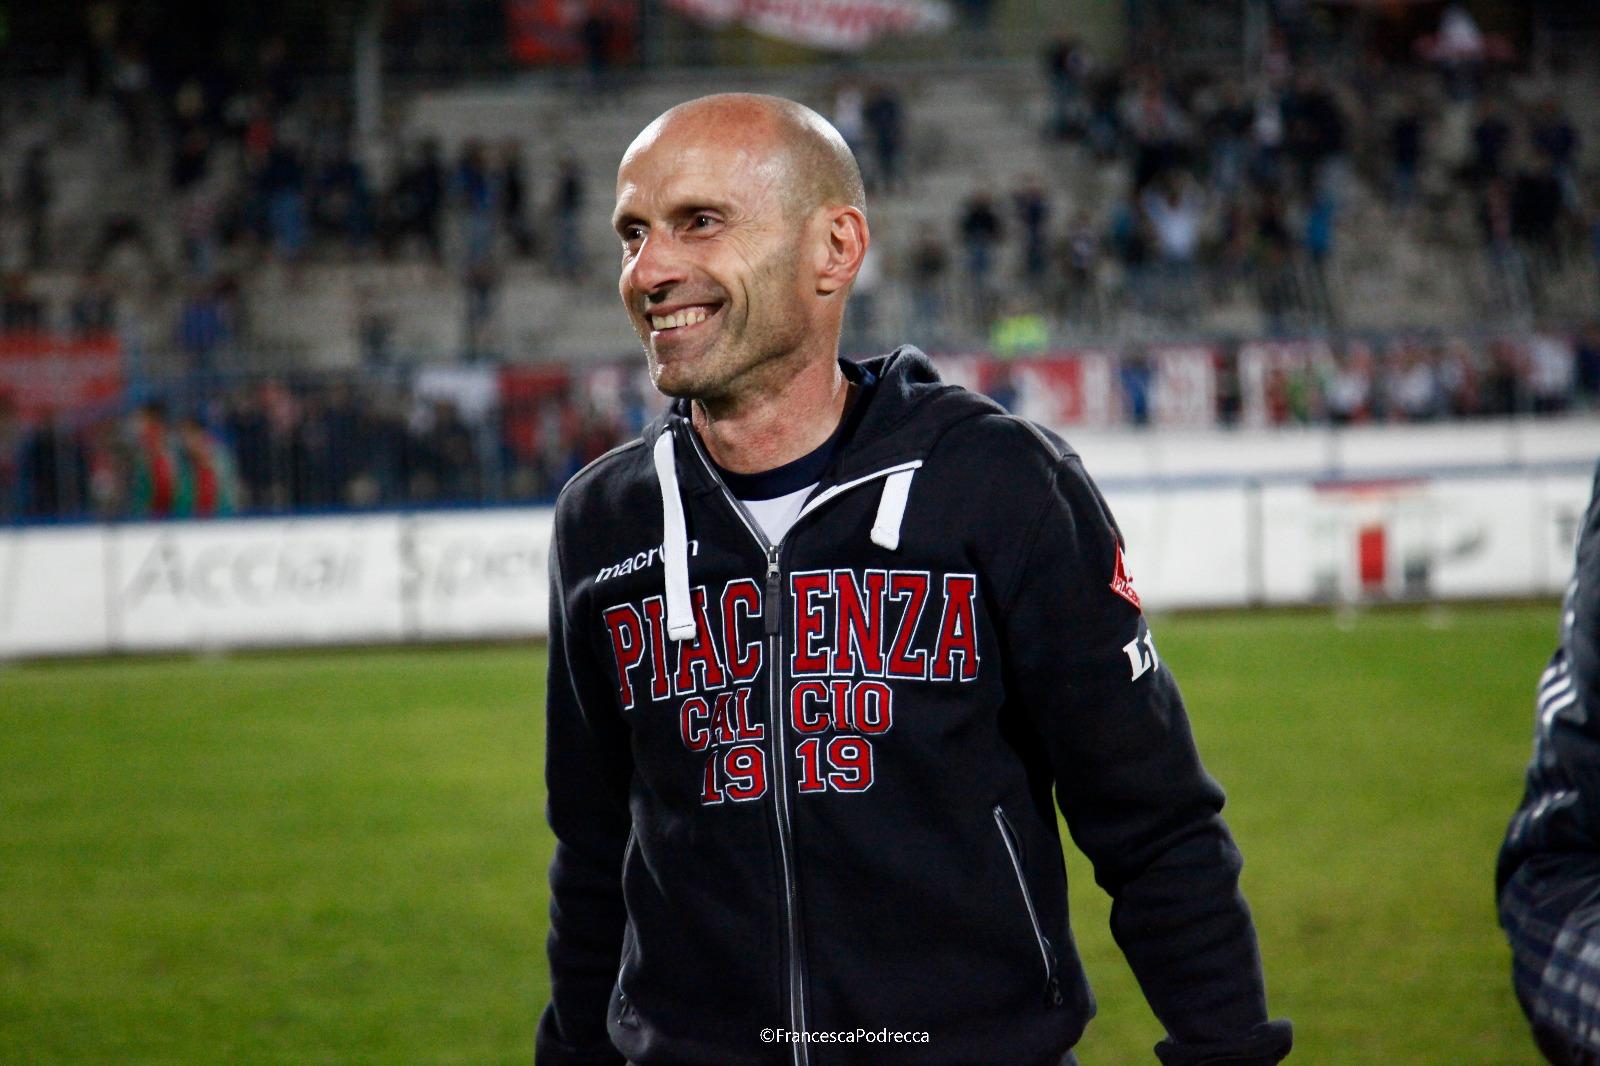 Piacenza - Pro Piacenza